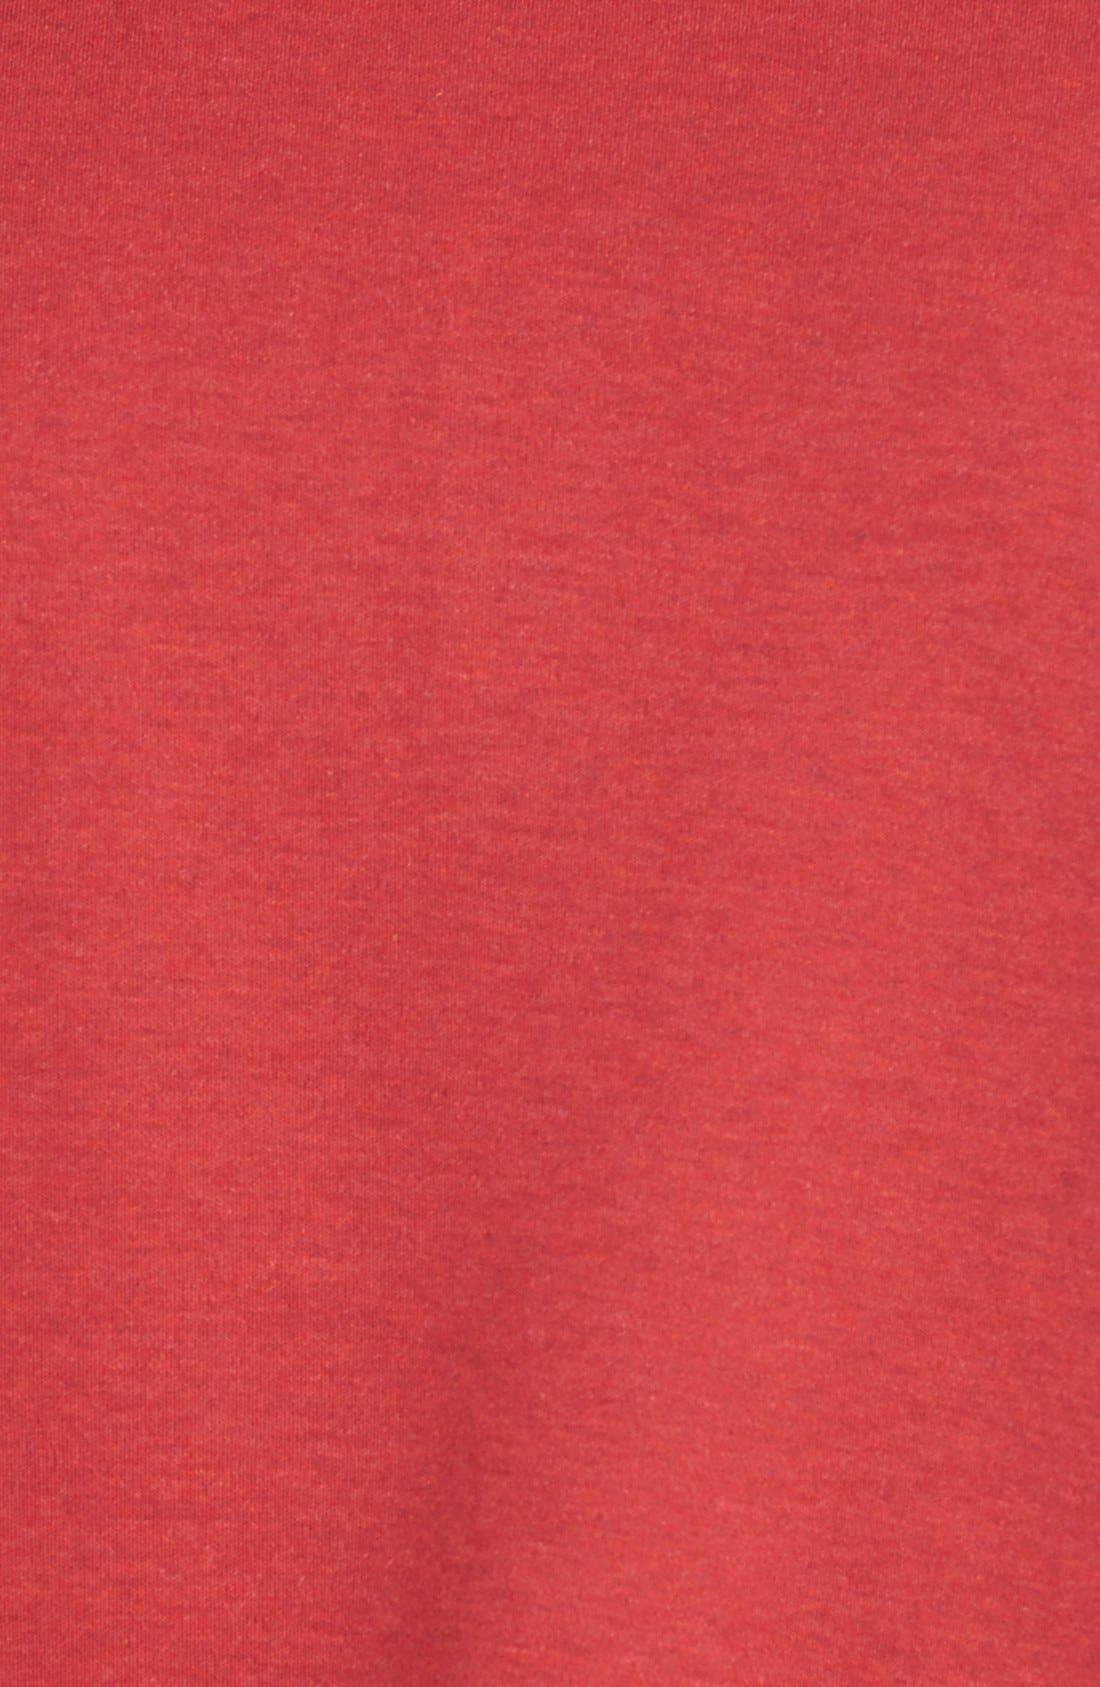 Alternate Image 3  - Nordstrom Men's Shop Regular Fit Interlock Knit Polo